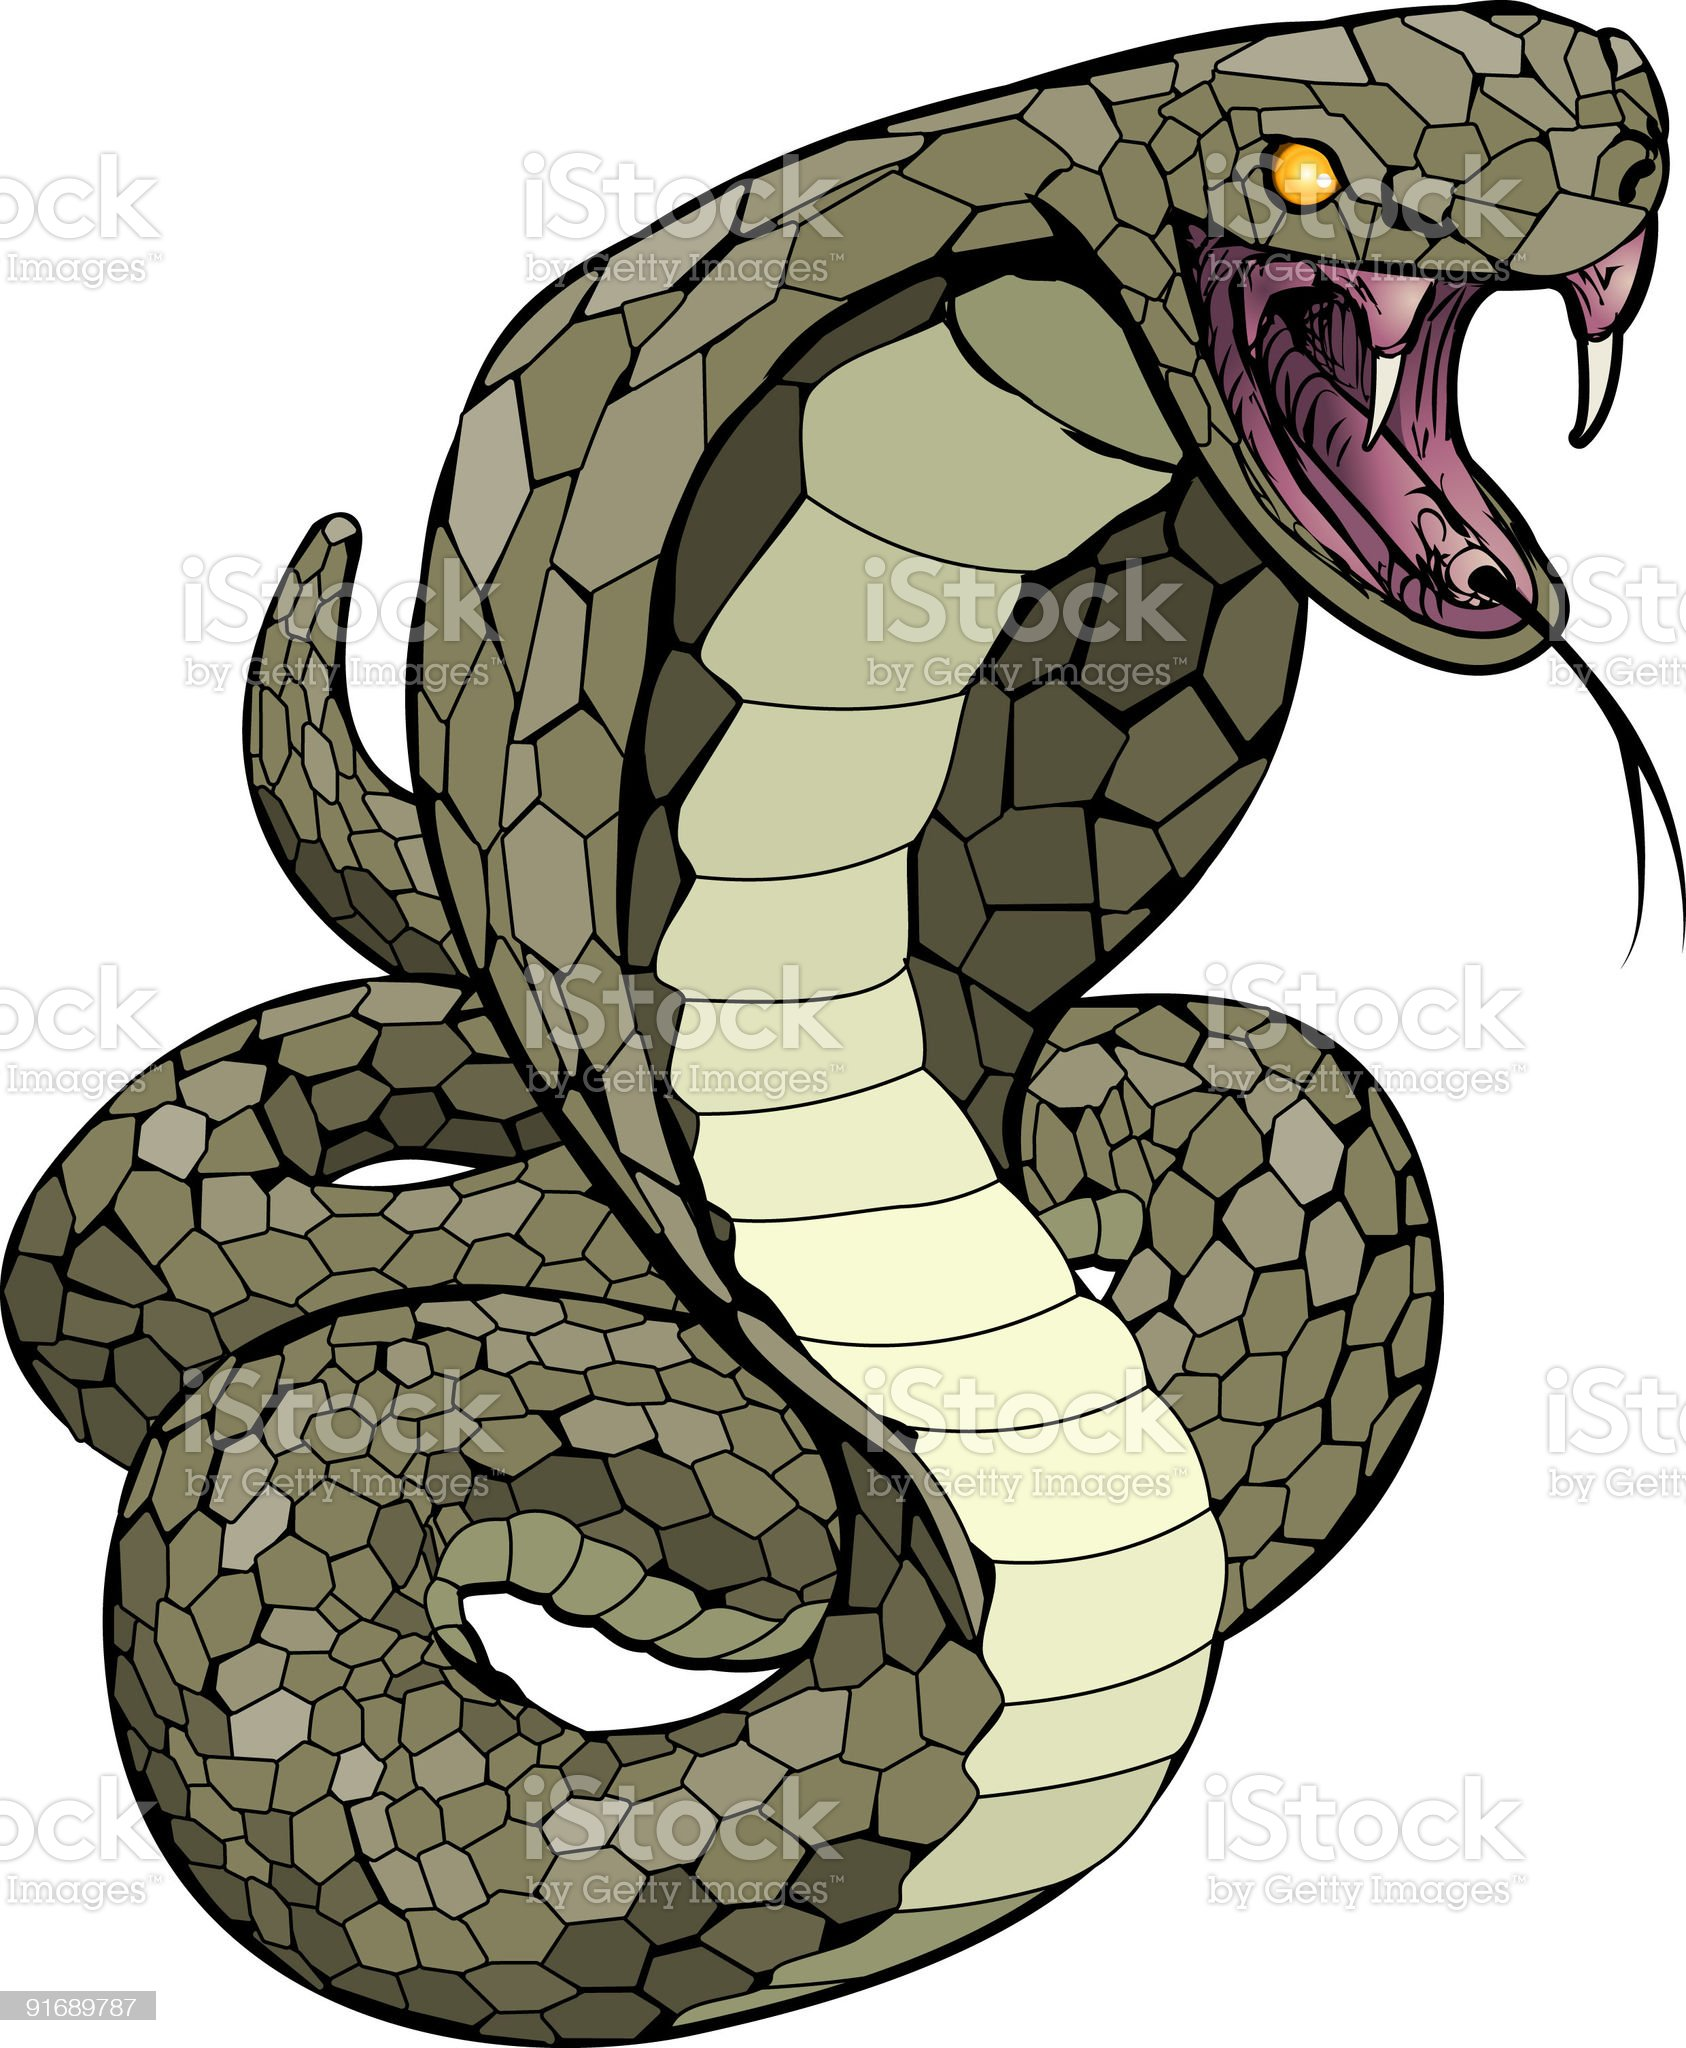 Cobra snake about to strike illustration royalty-free stock vector art